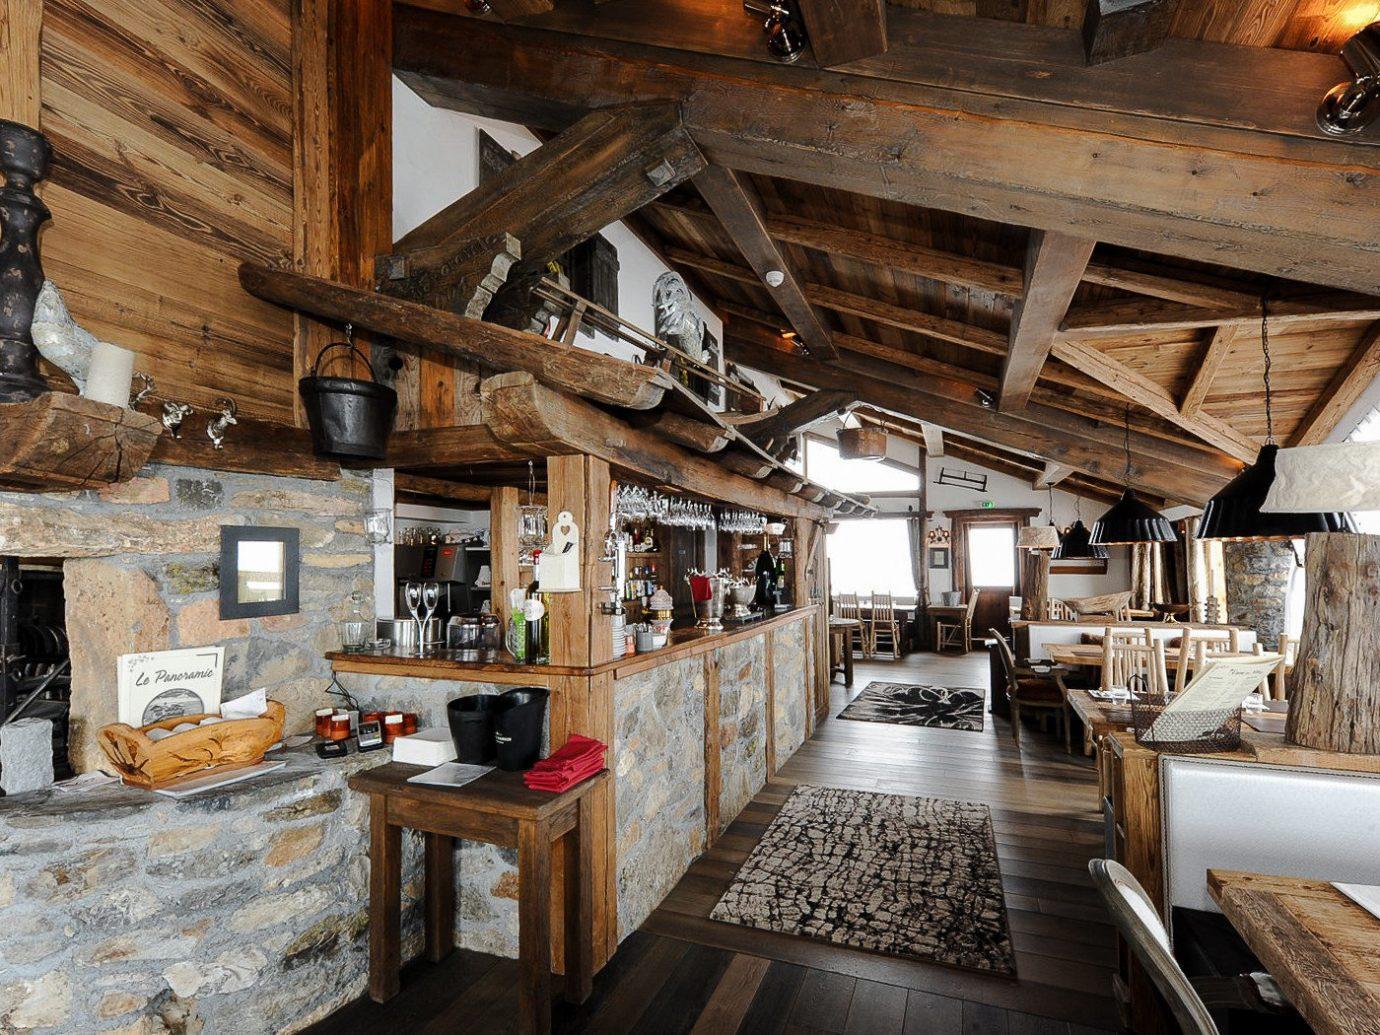 Interior of Le Panoramic, Chamonix, France